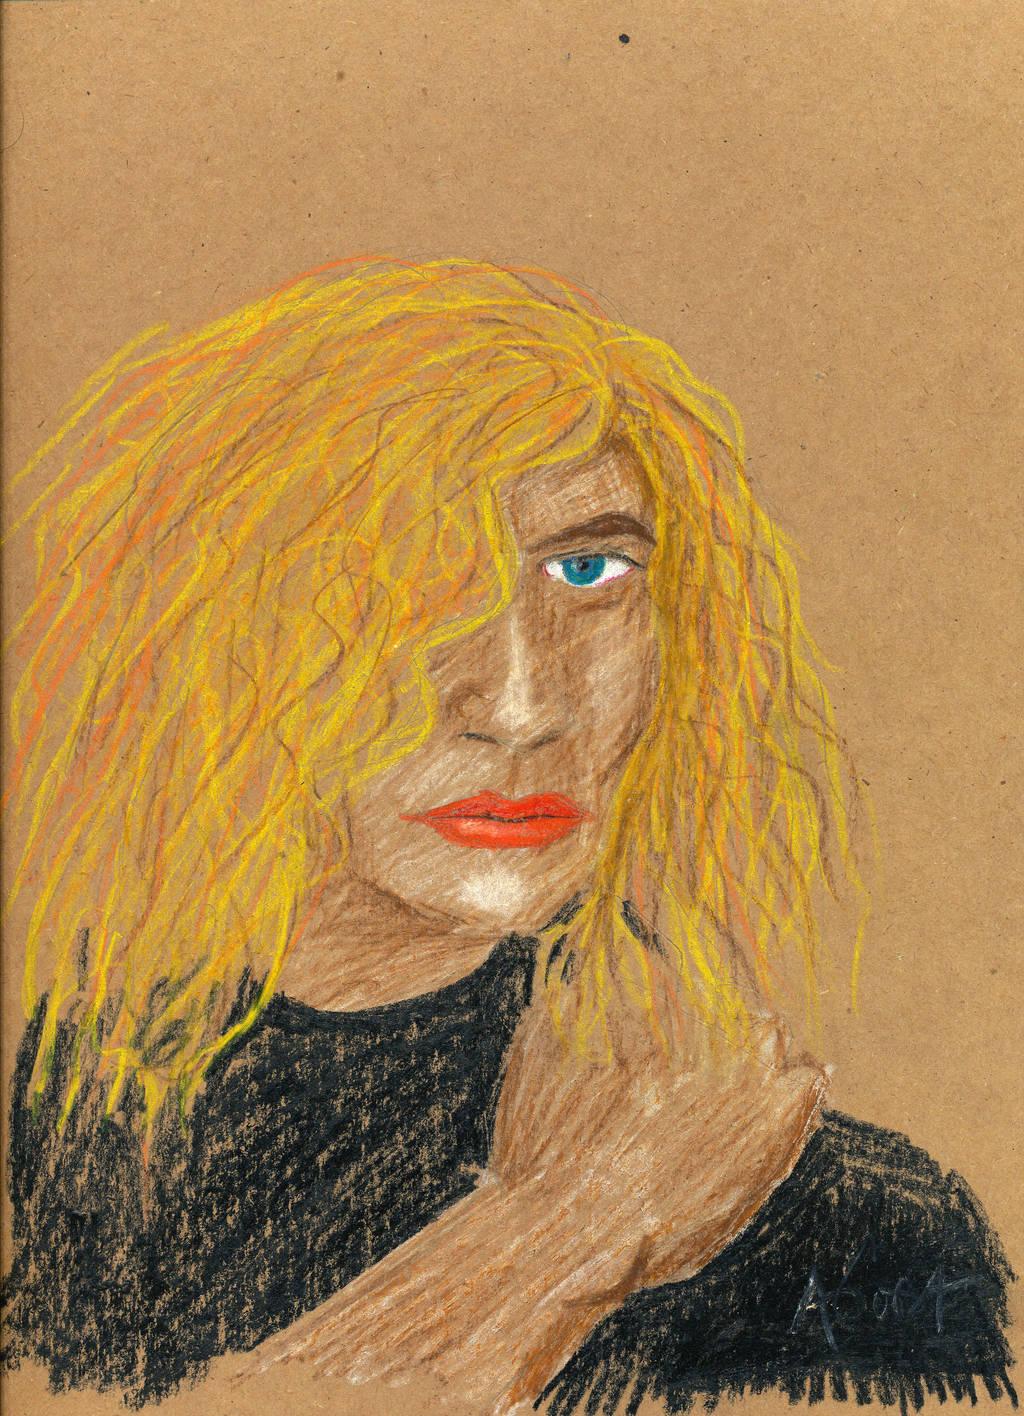 Portrait of a Woman by AgustinGoba